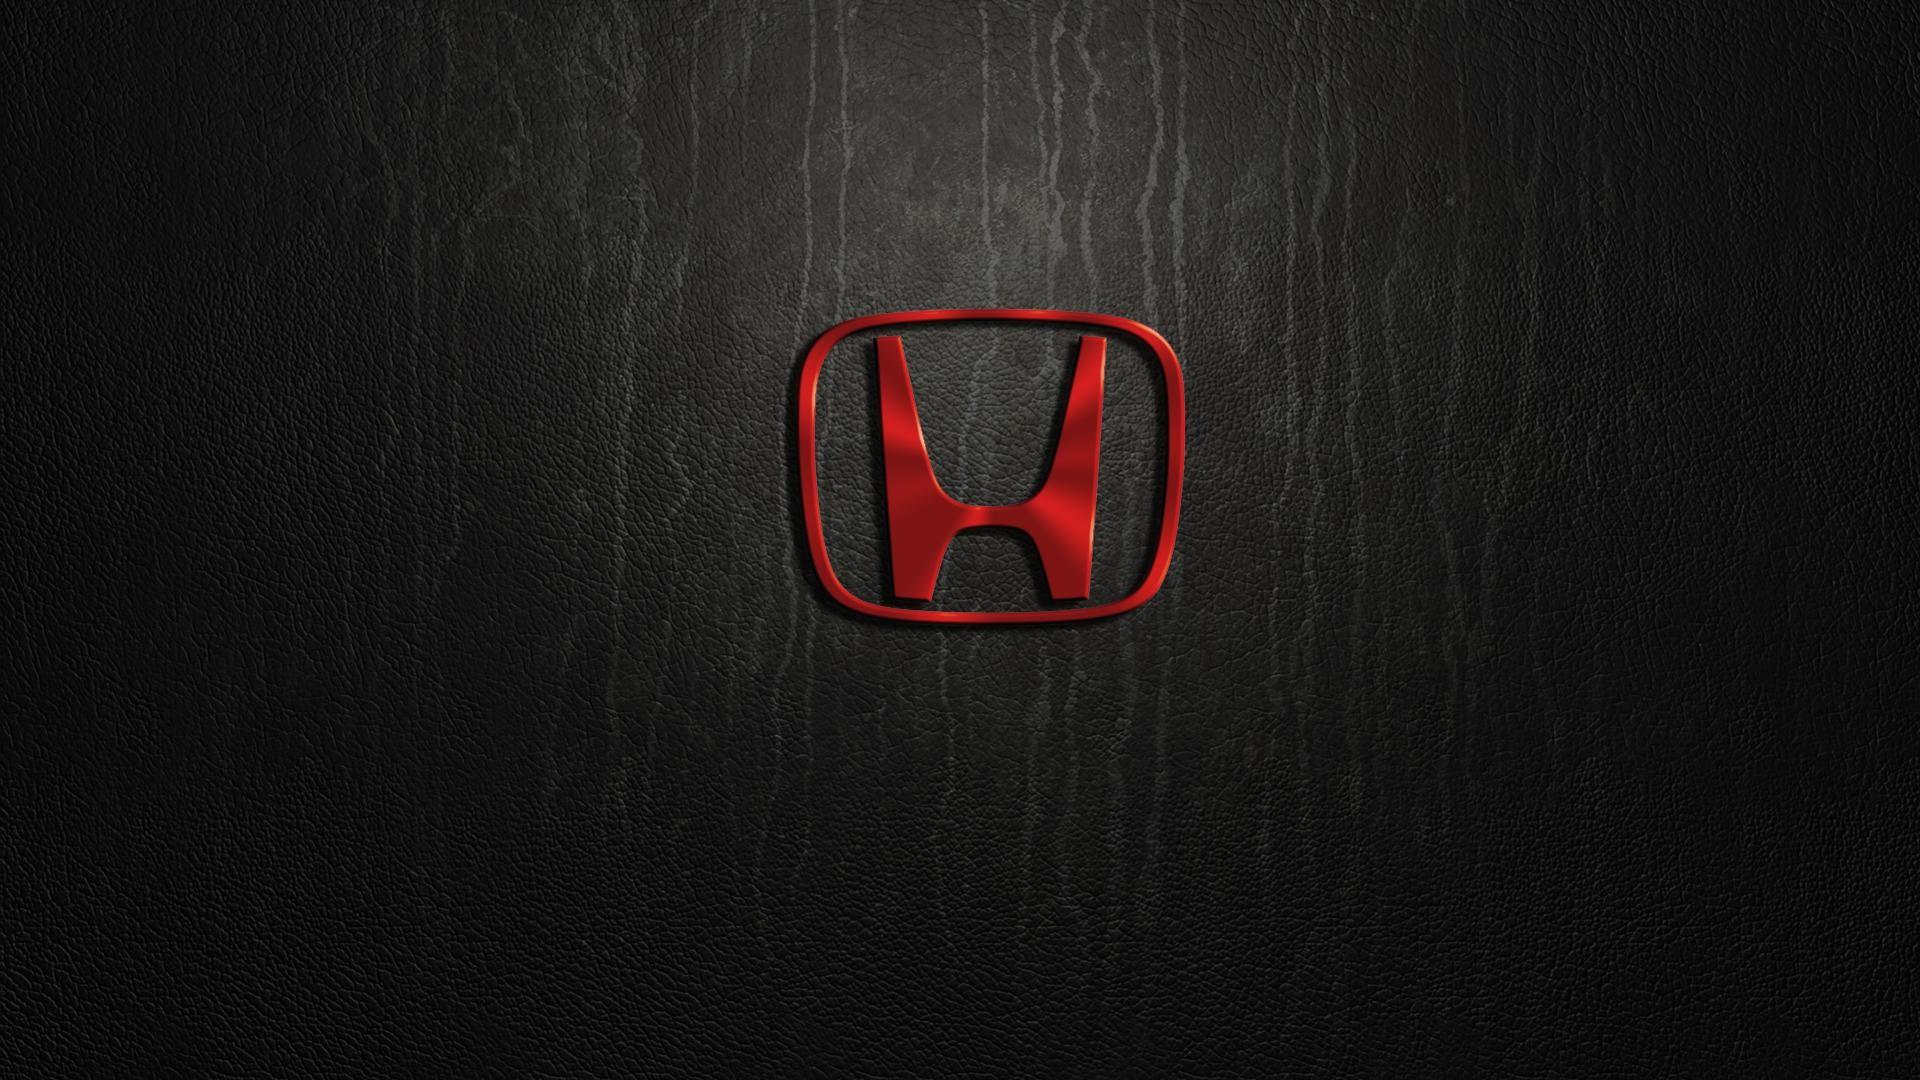 Honda Civic Imid Wallpaper 54 images 1920x1080